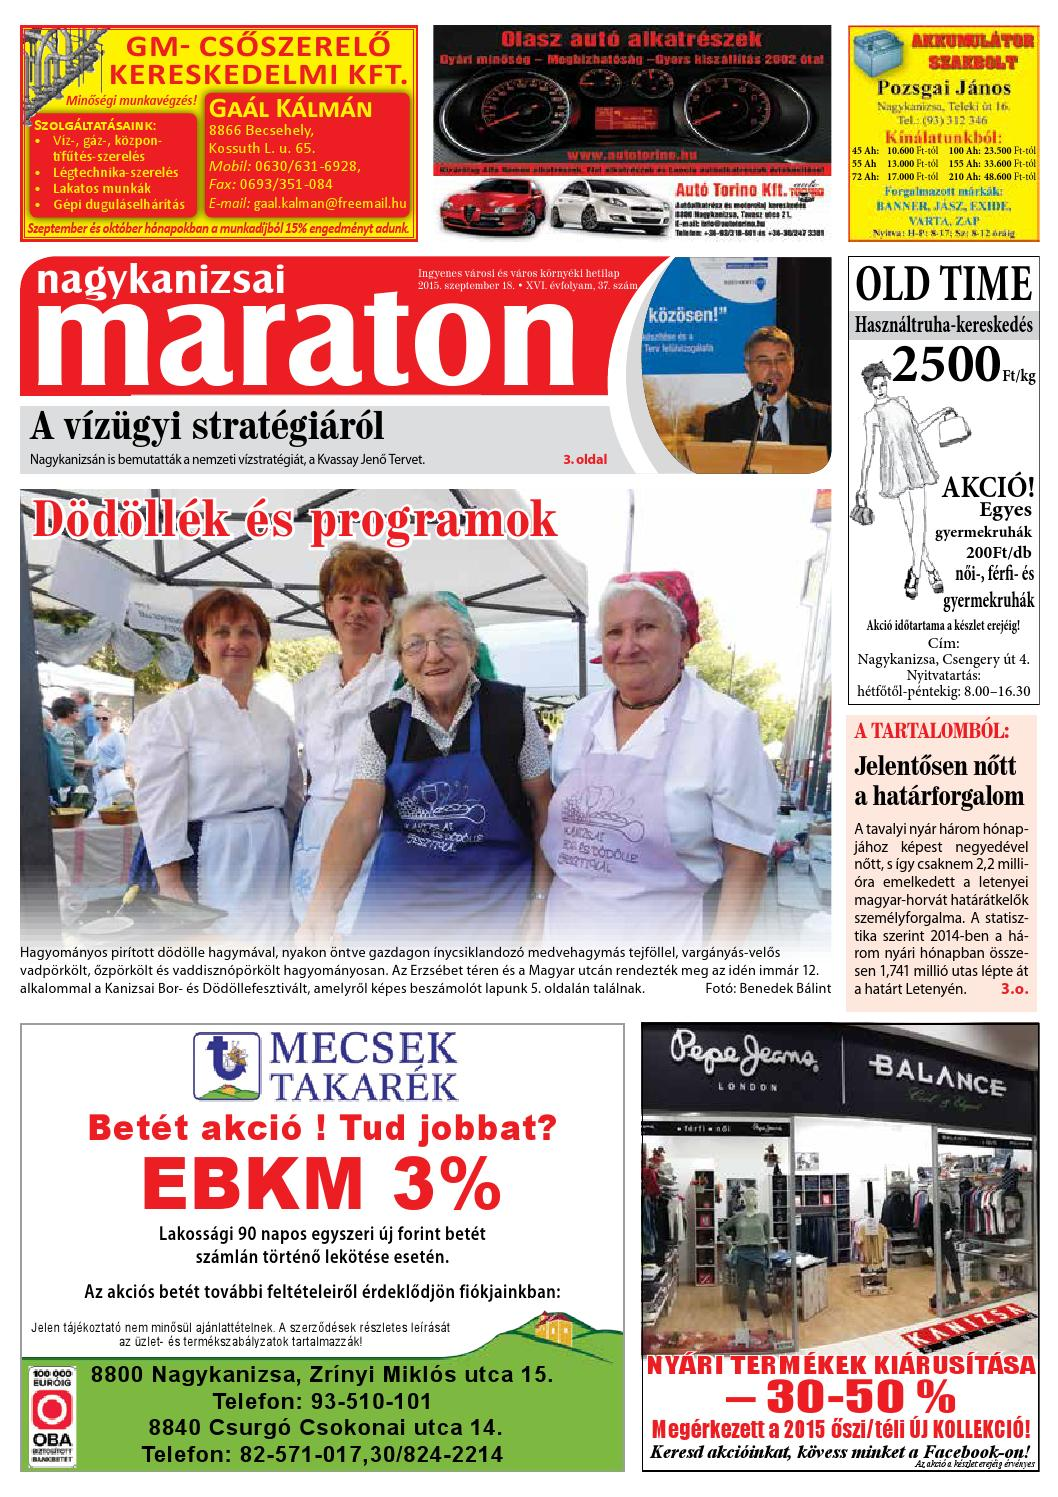 Nagykanizsai Maraton - 2015. 09. 18. by Maraton Lapcsoport Kft. - issuu 77f41d54bb